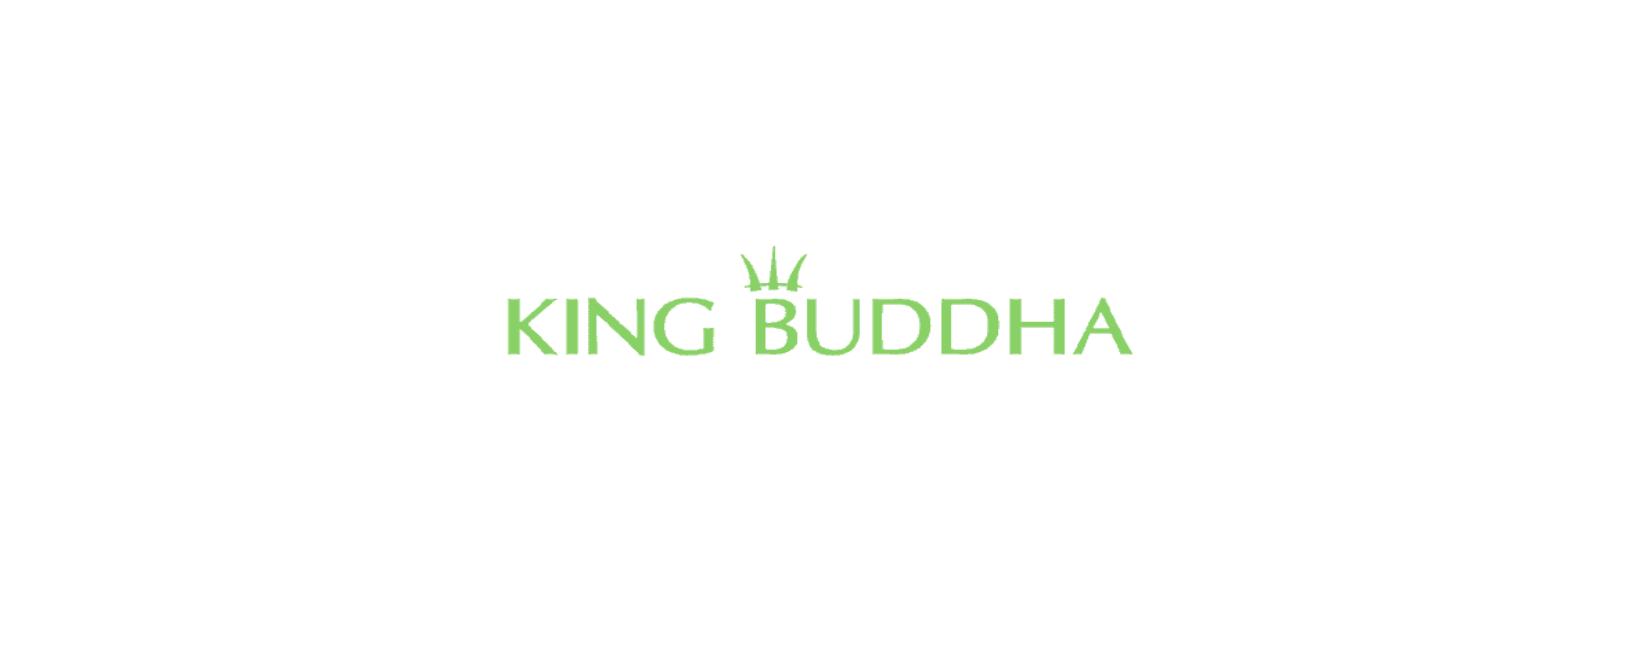 King Buddha Discount Code 2021